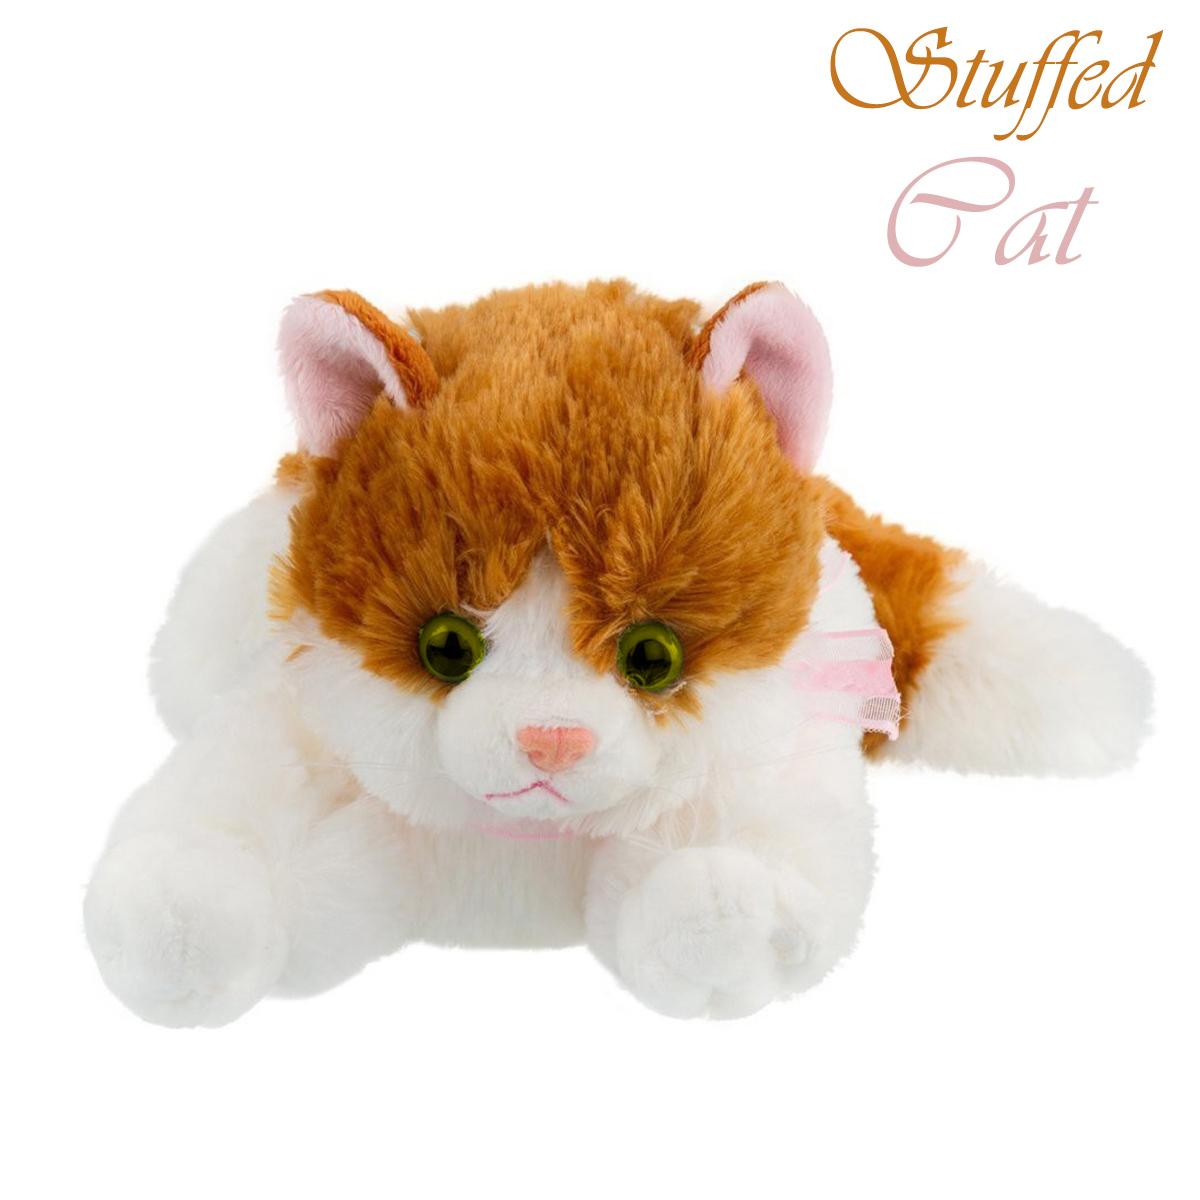 Cat Stuffed Animal Soft Cat Plush Toy Persian Cat Stuff Toy White Color 35 cm